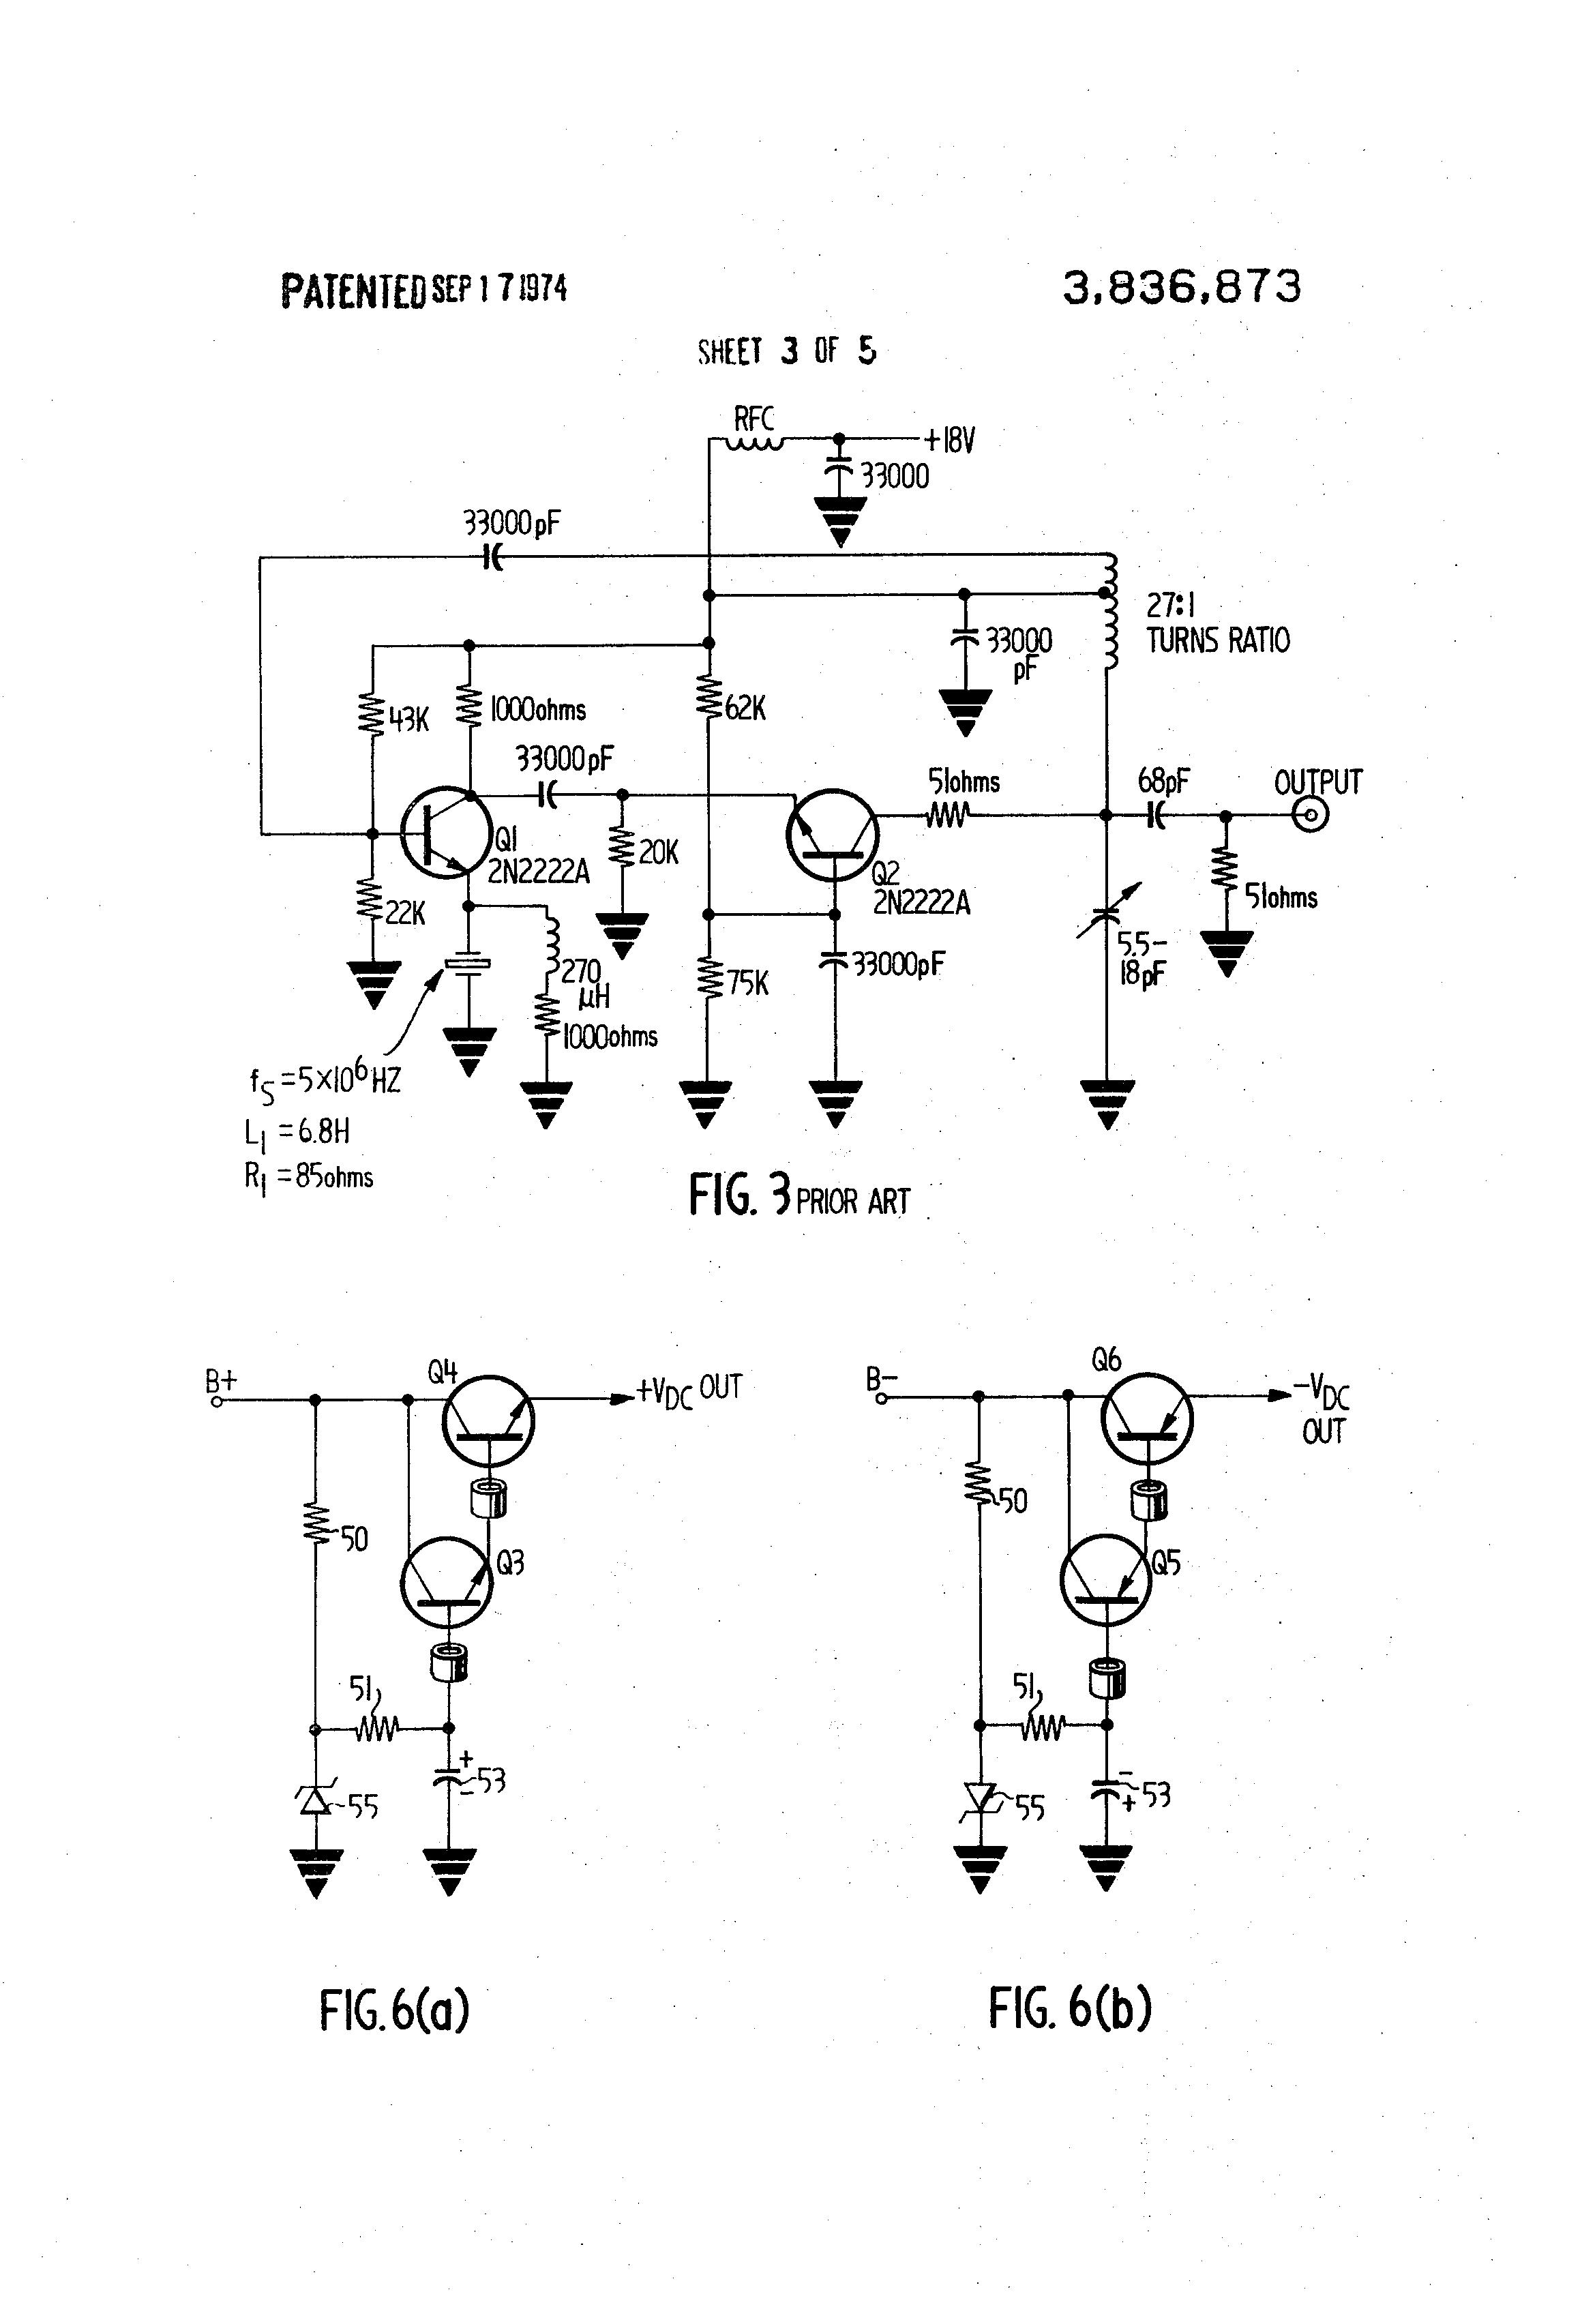 Transistor Bc547 Datasheet further Wahped additionally US3836873 moreover Semiconductor Symbols also EL 20TRANSISTOR. on transistor biasing